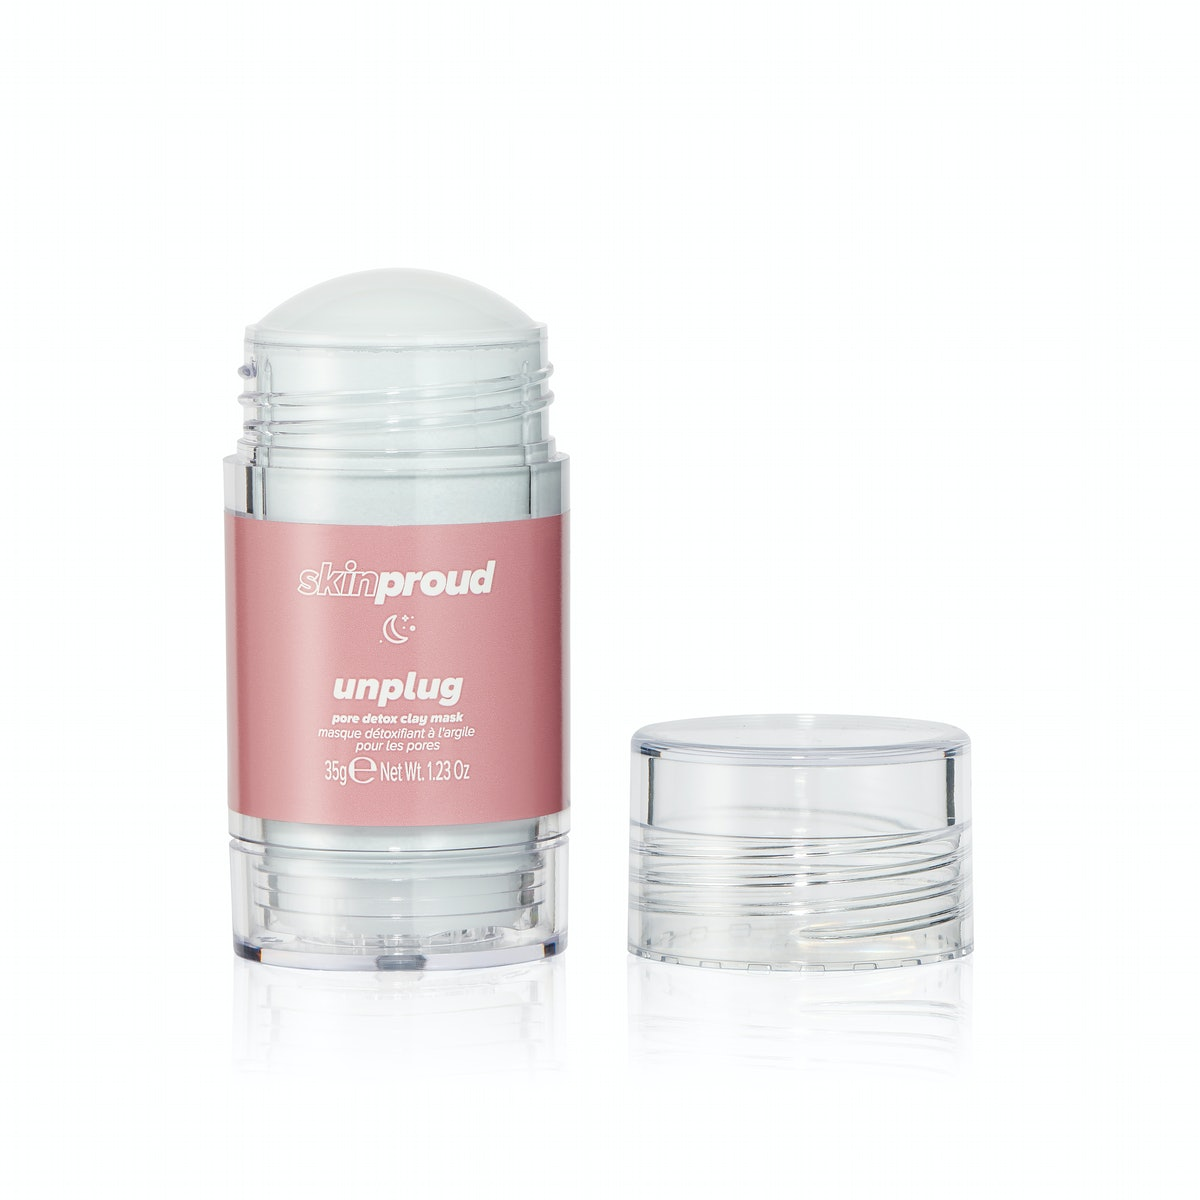 Skin Proud Unplug Pore Detox Clay AHA Mask